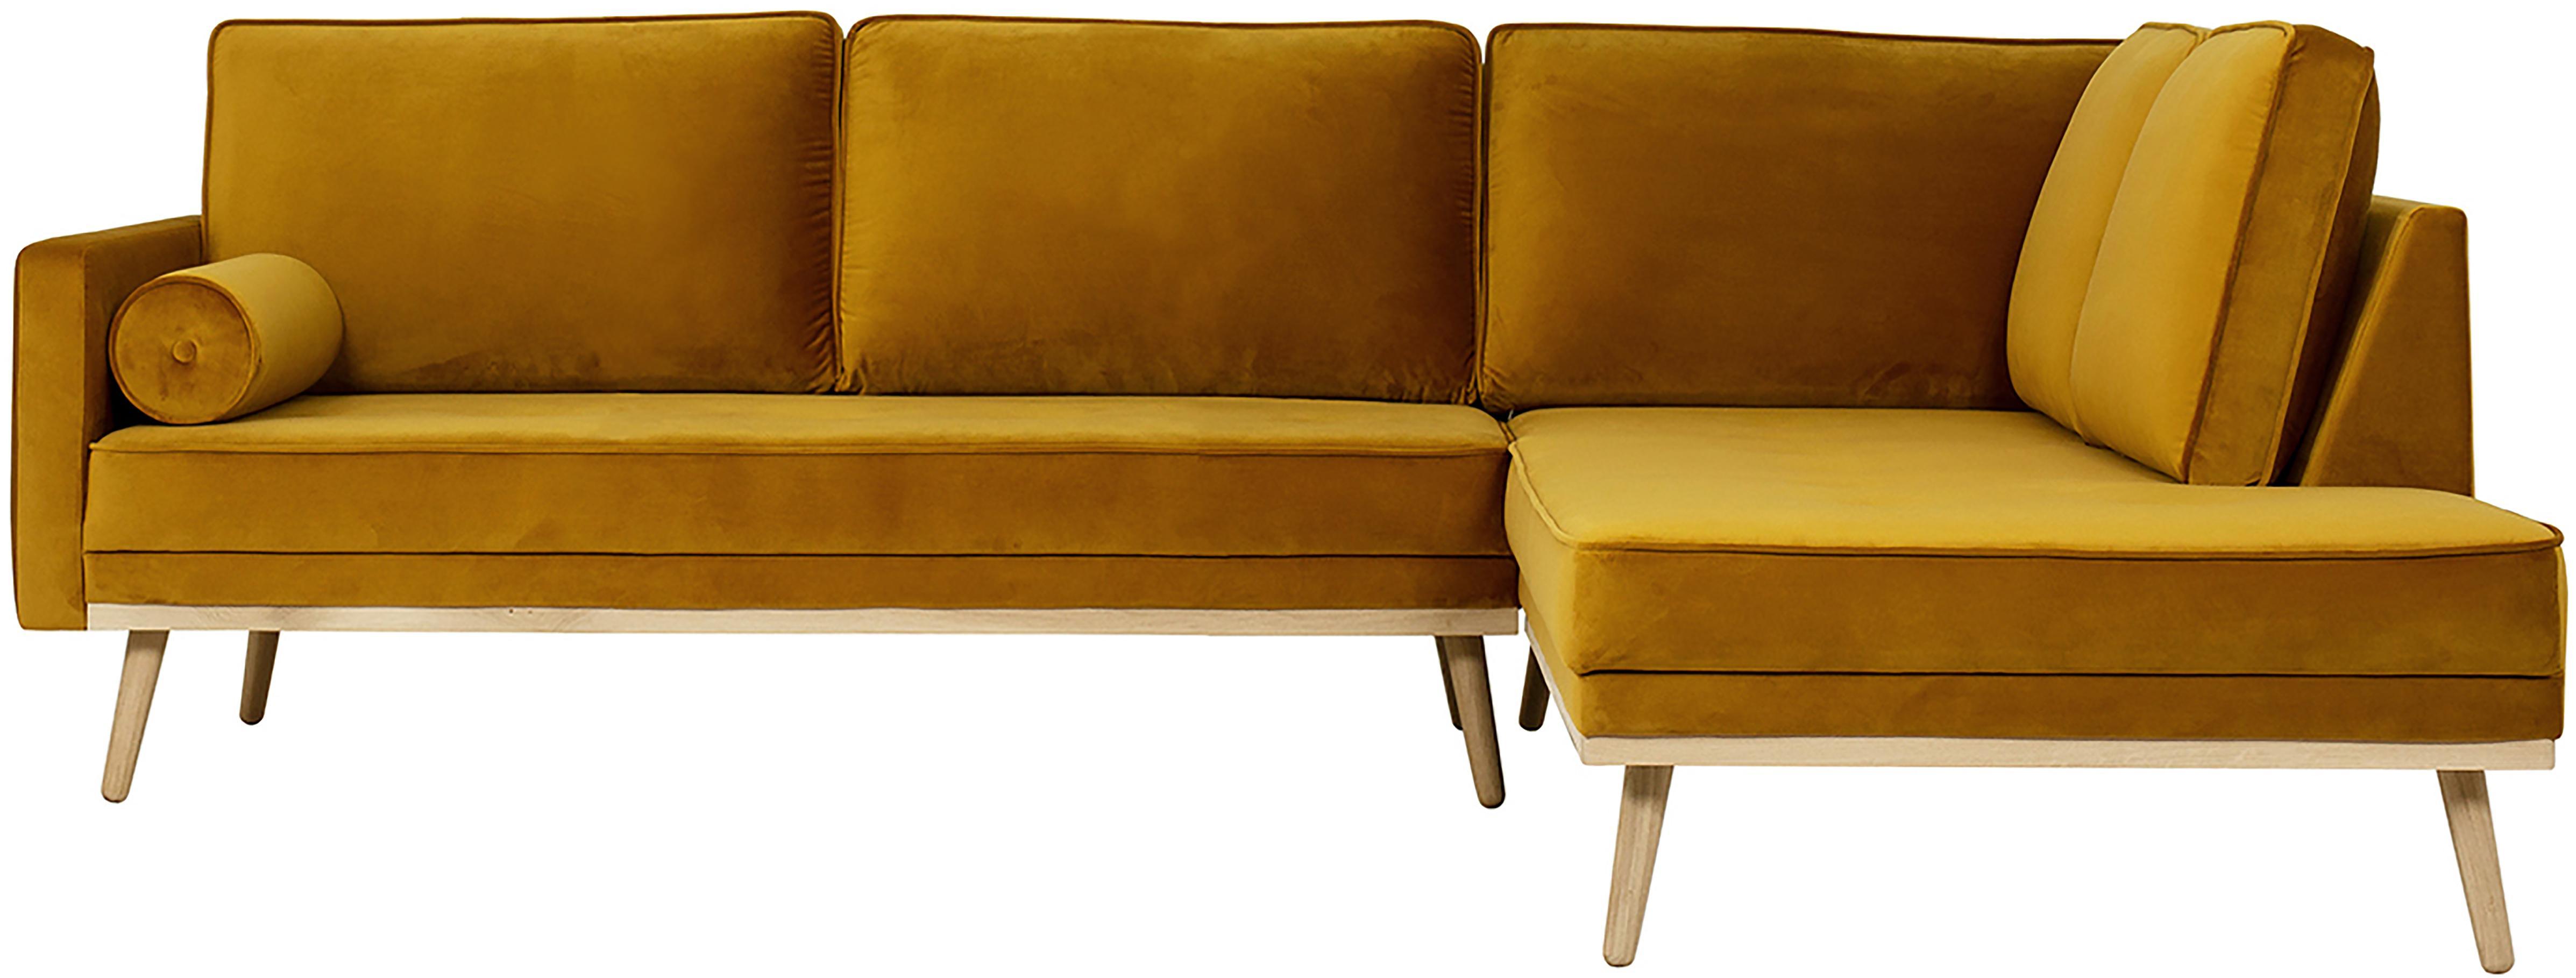 Samt-Ecksofa Saint (3-Sitzer), Bezug: Samt (Polyester) Der hoch, Gestell: Massives Eichenholz, Span, Samt Senfgelb, B 243 x T 220 cm